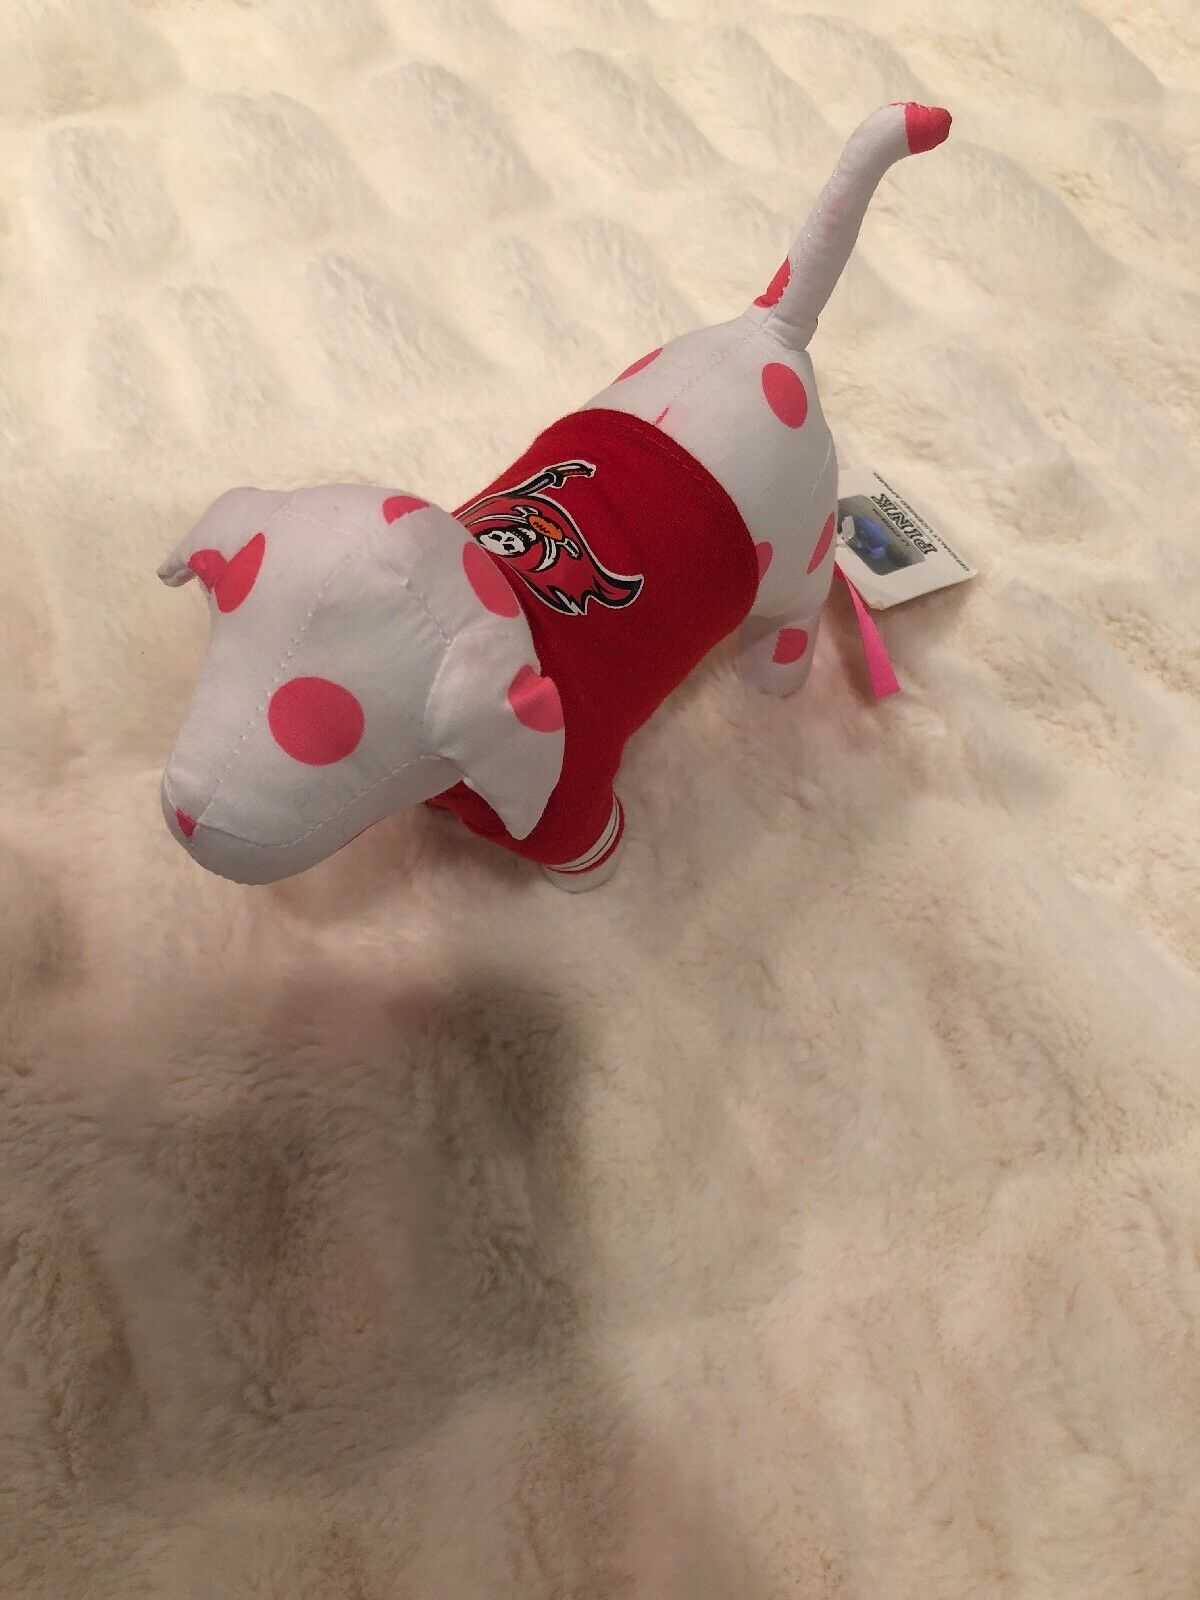 Victoria's Secret rosa NFL dog Tampa bay buccaneers jersey T-shirt dog vs pup